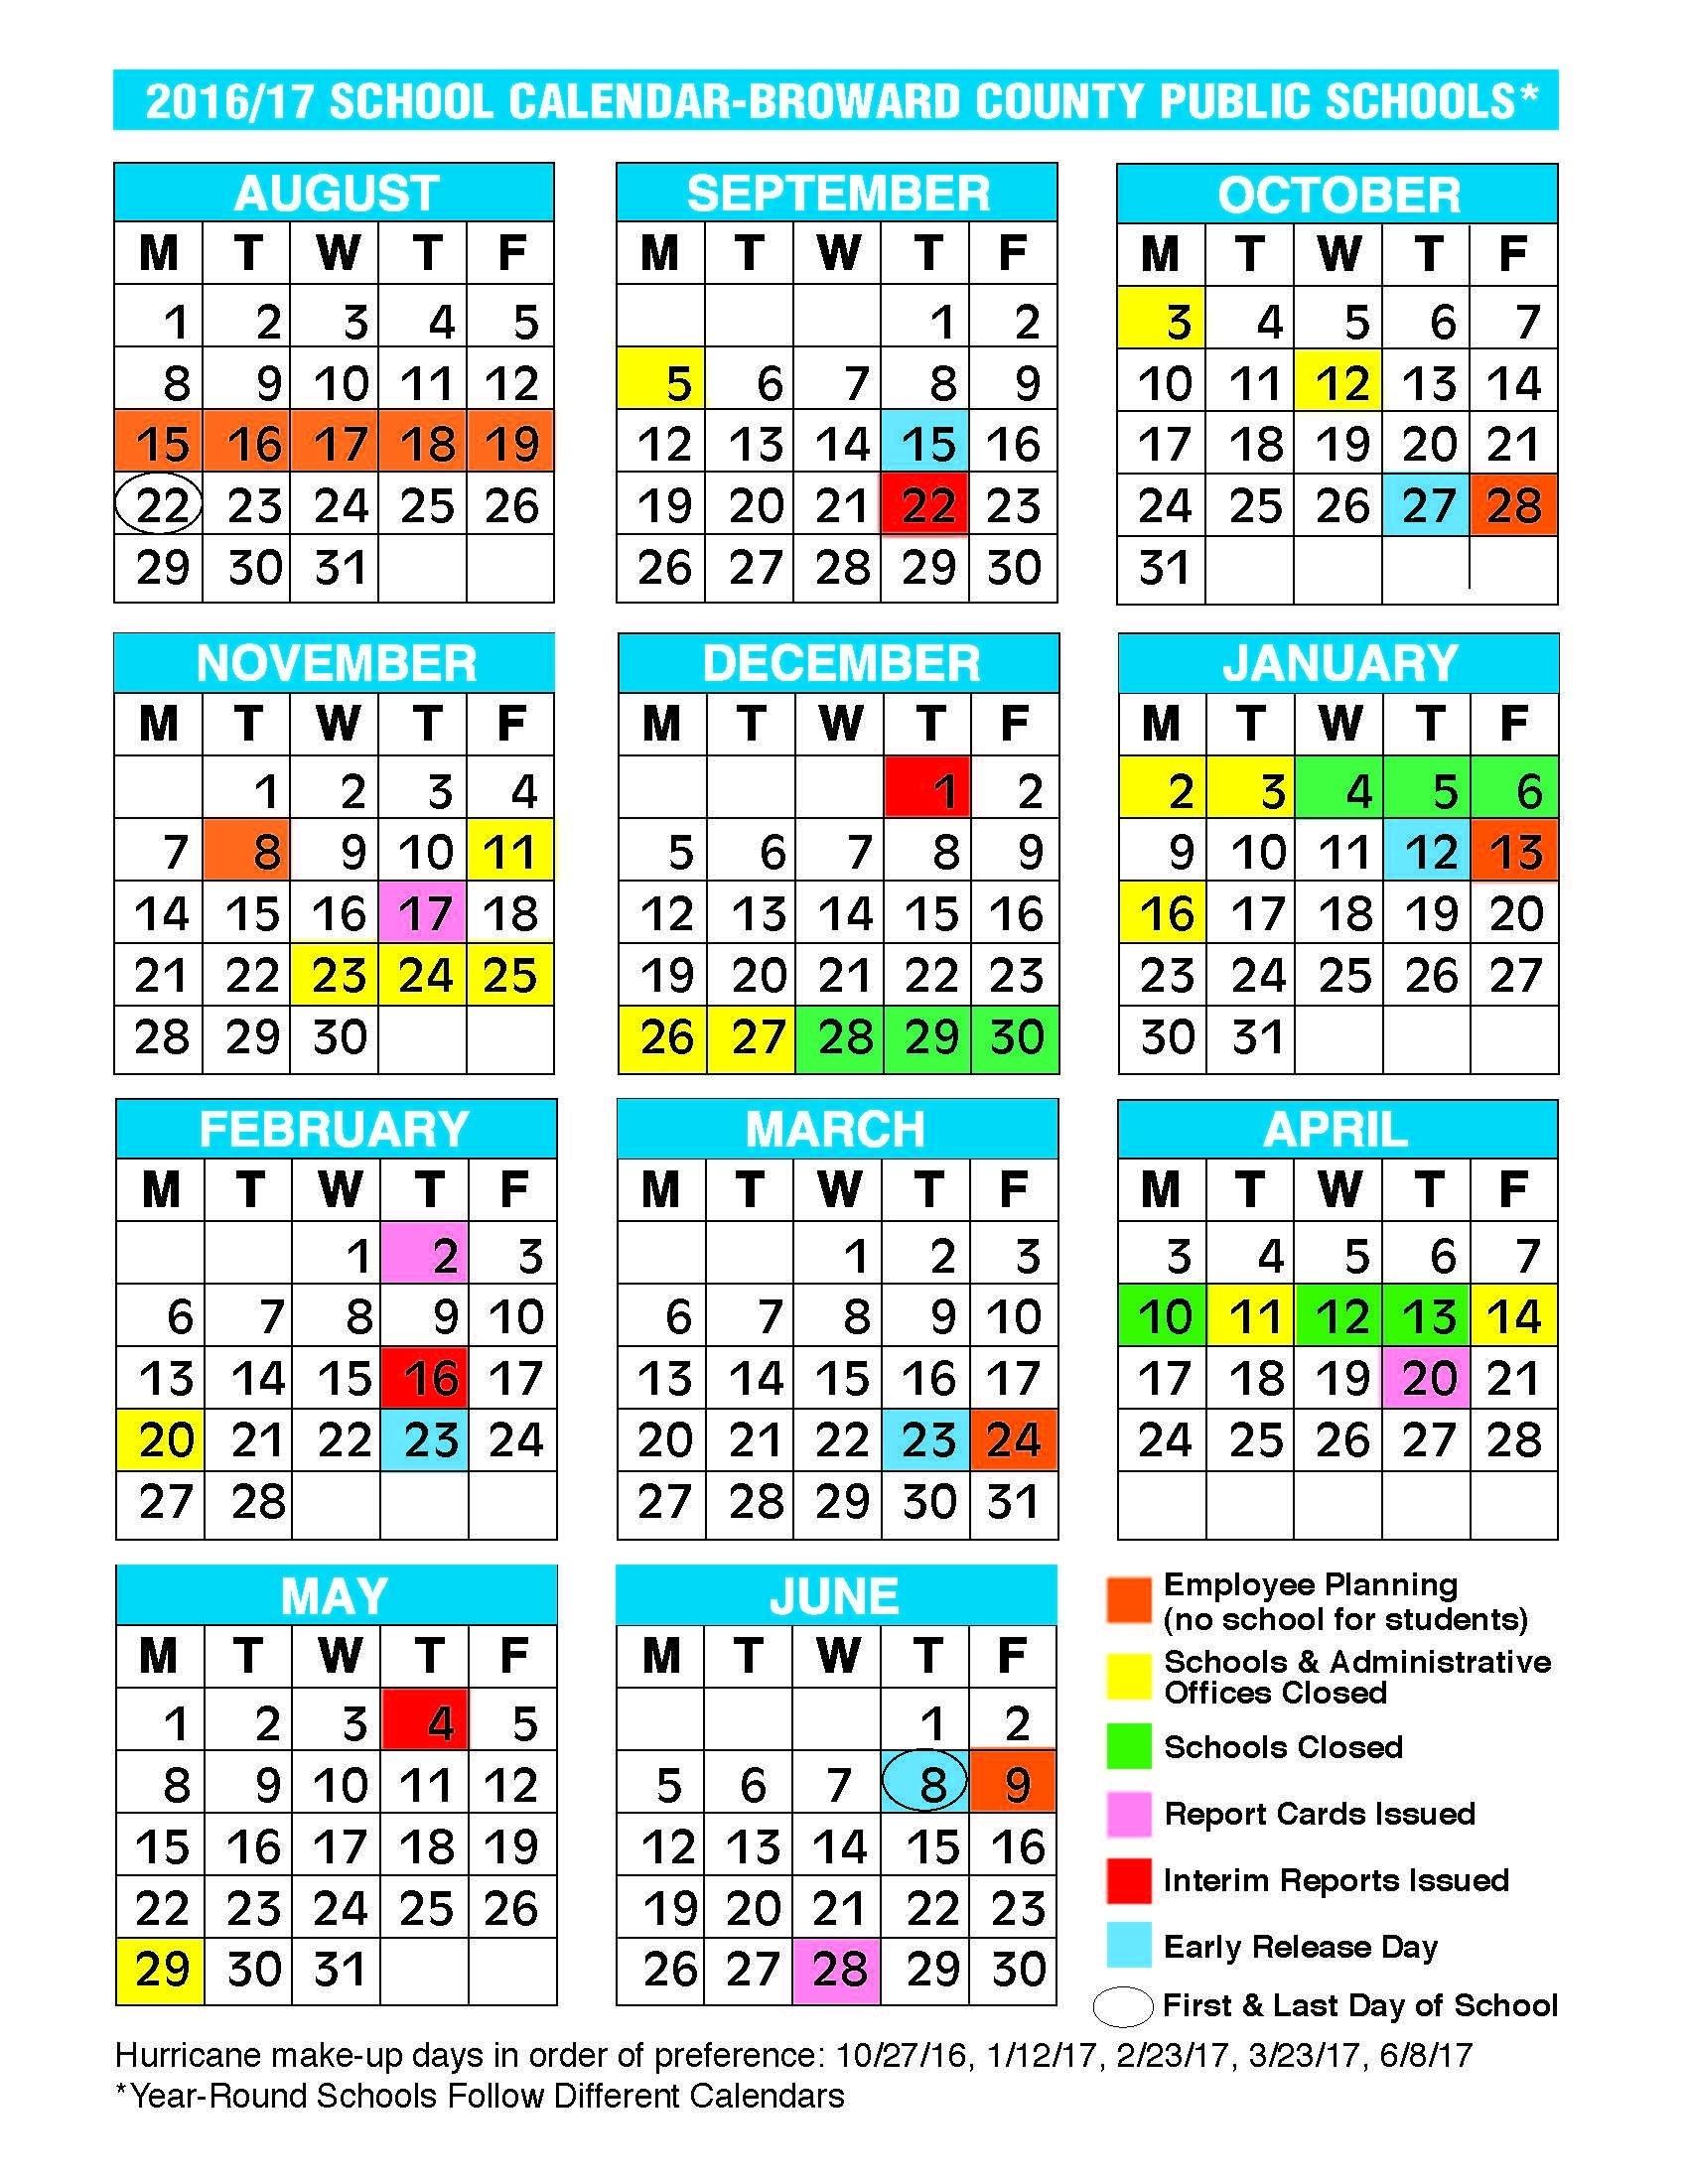 2017 2018 School Calendar Broward 2017 2016 School Calendar Broward Exceptional School Calendar In Broward County